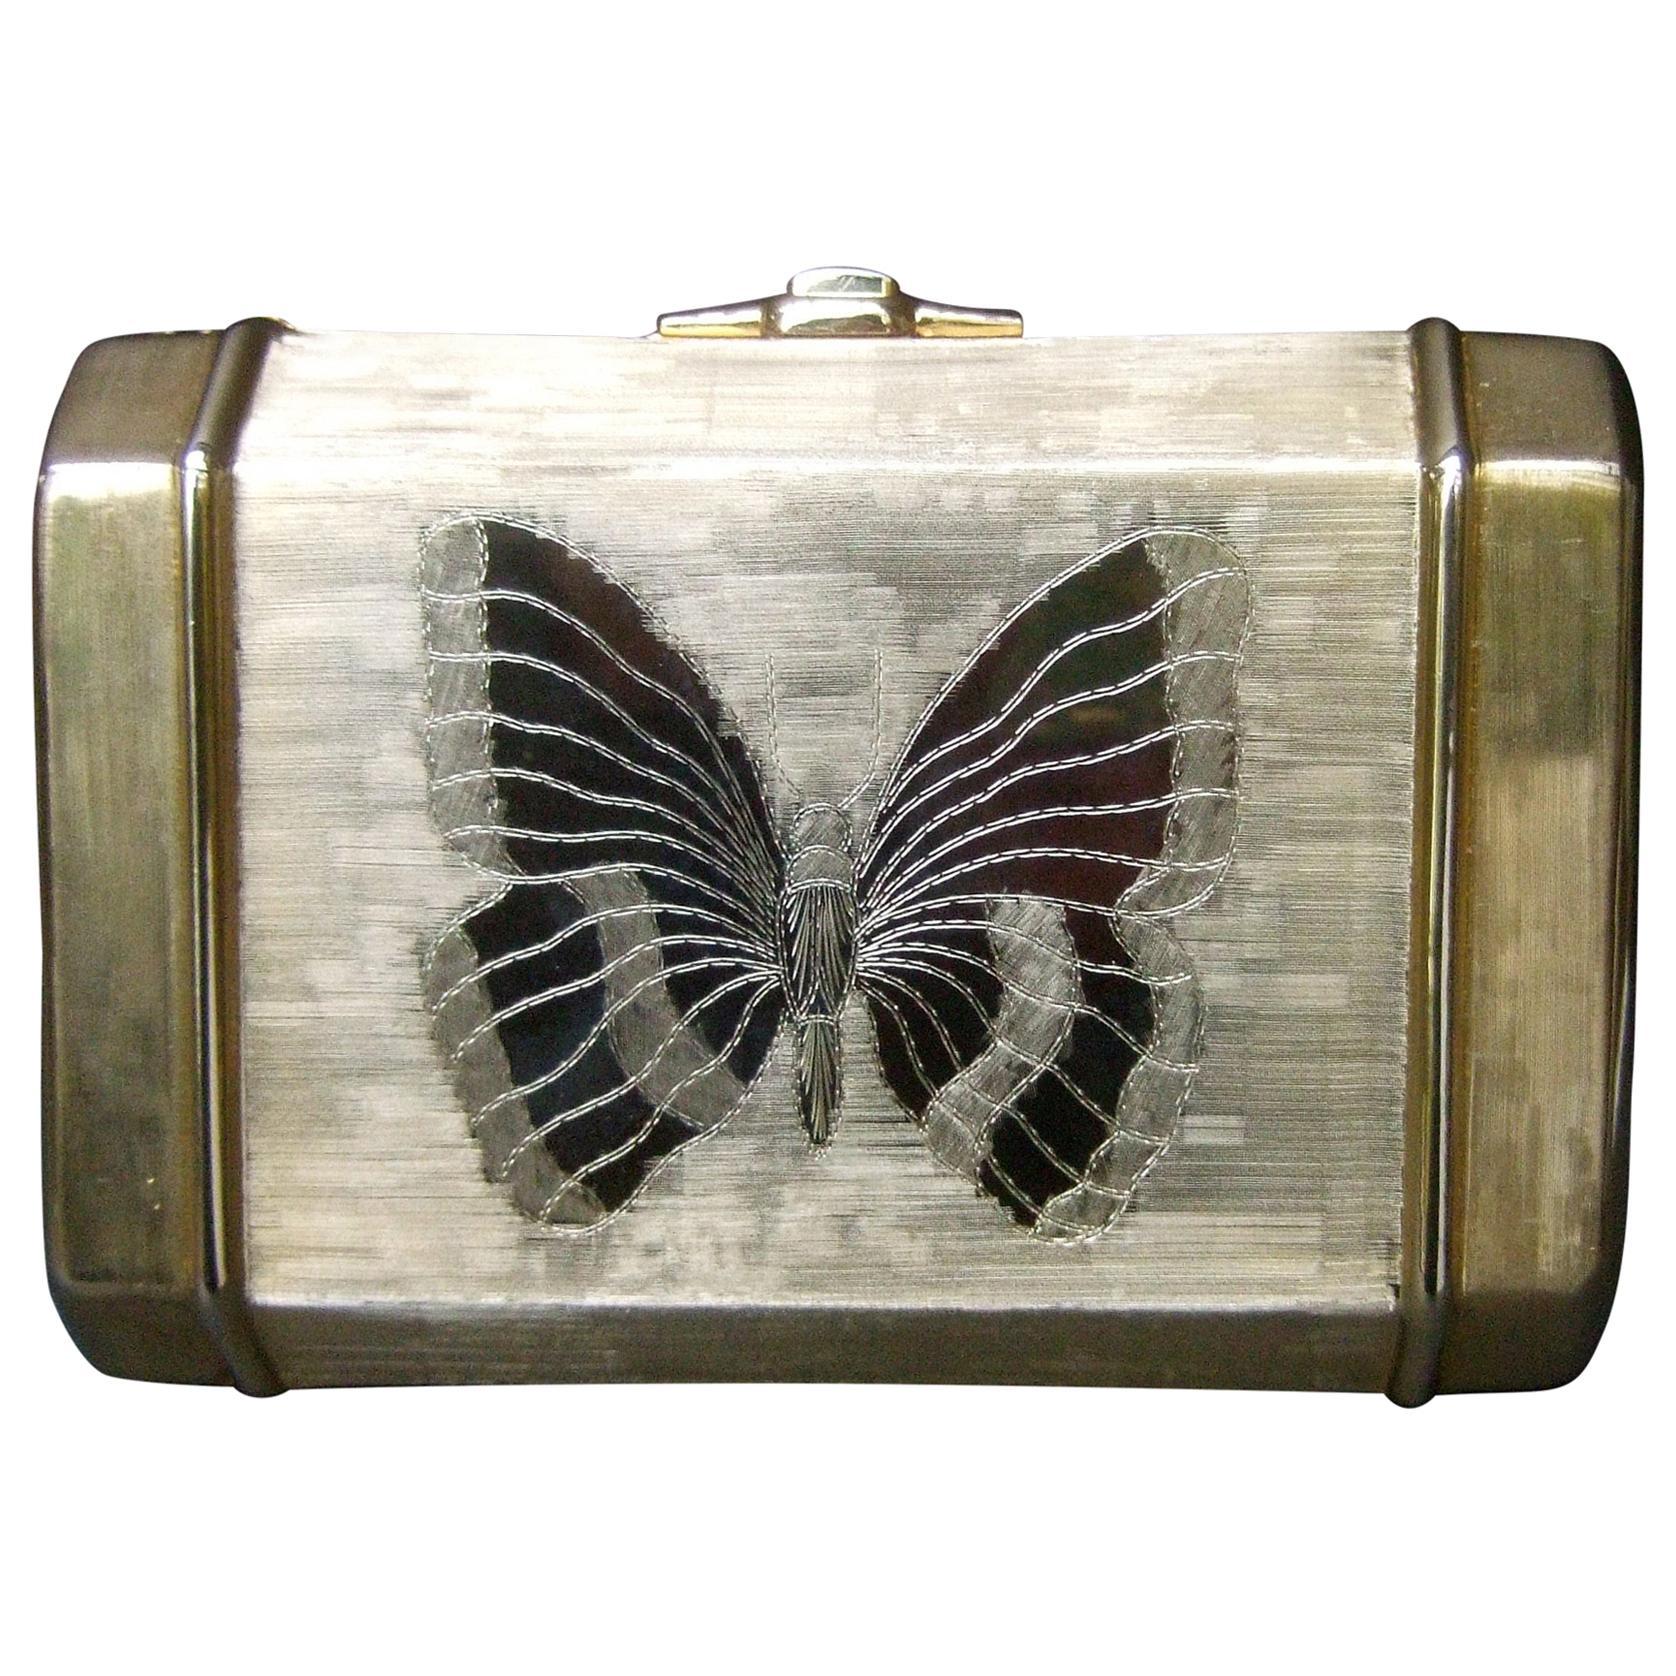 Saks Fifth Avenue Gilt Metal Butterfly Minaudière Evening Bag c 1970s